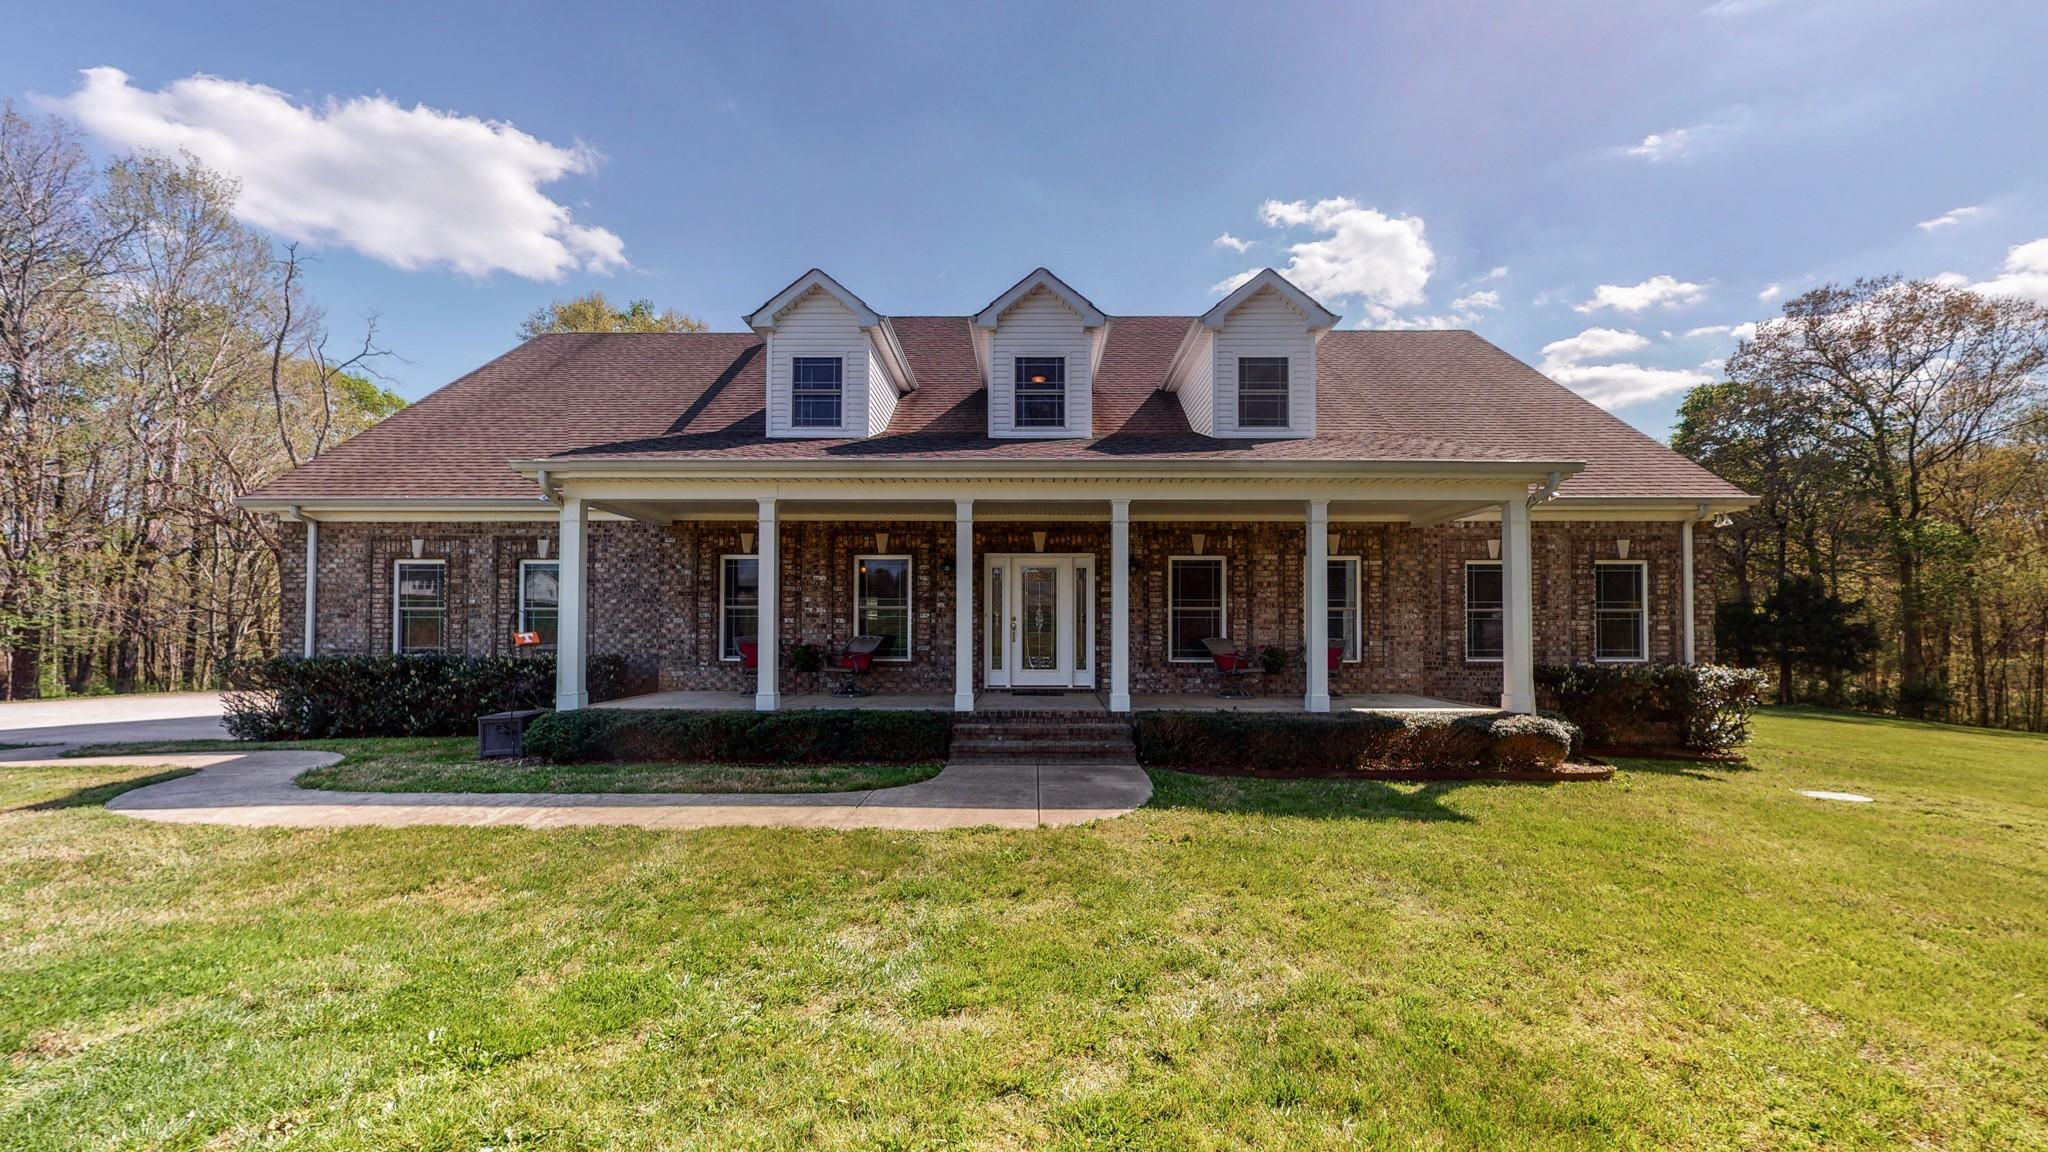 3982 Bilbrey Dr Property Photo - White House, TN real estate listing